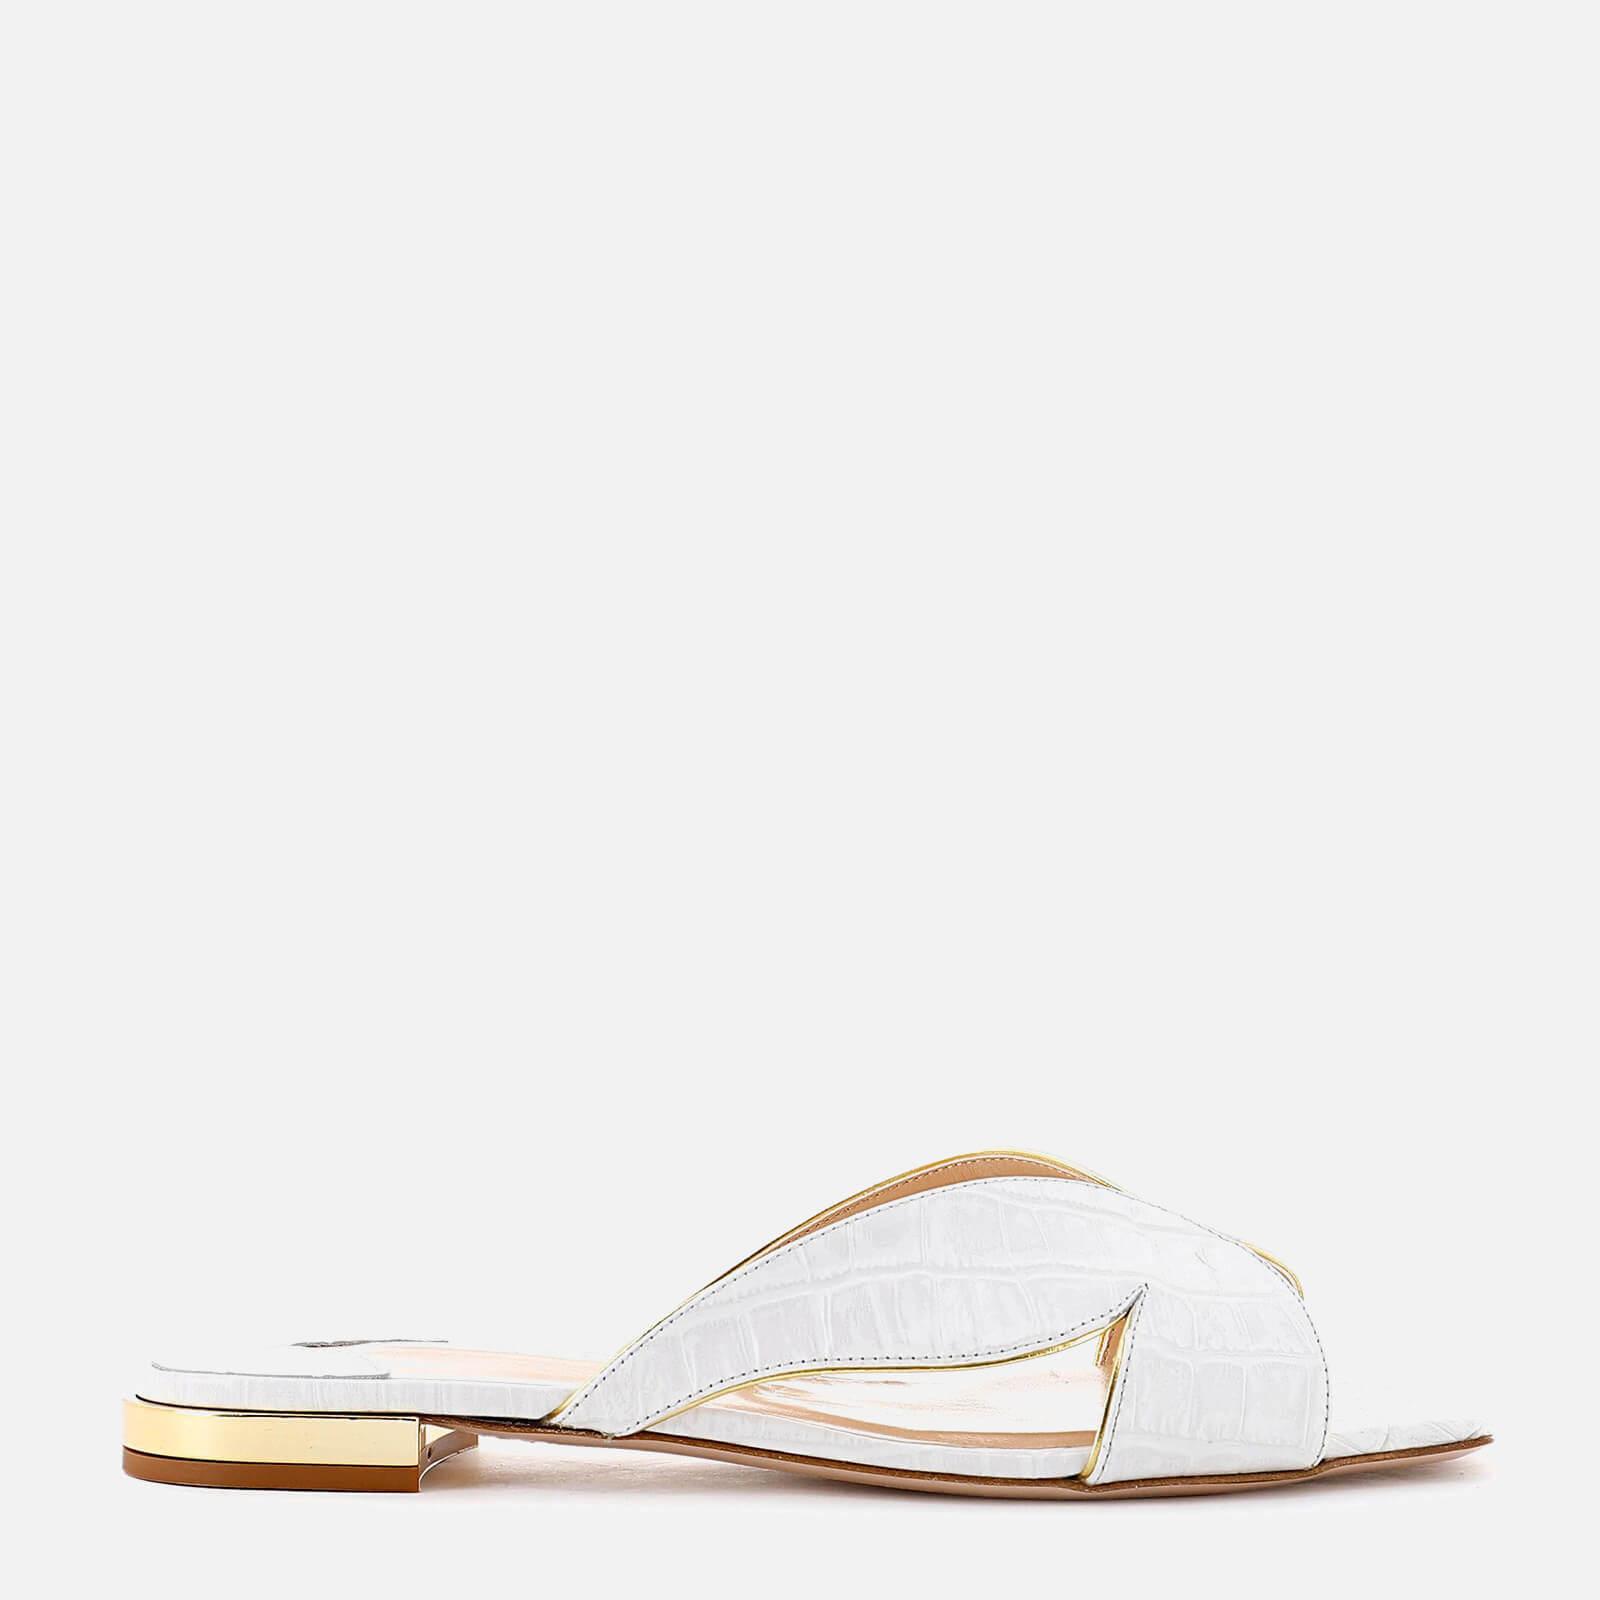 Sophia Webster Women's Rita Croc Flat Sandals - White